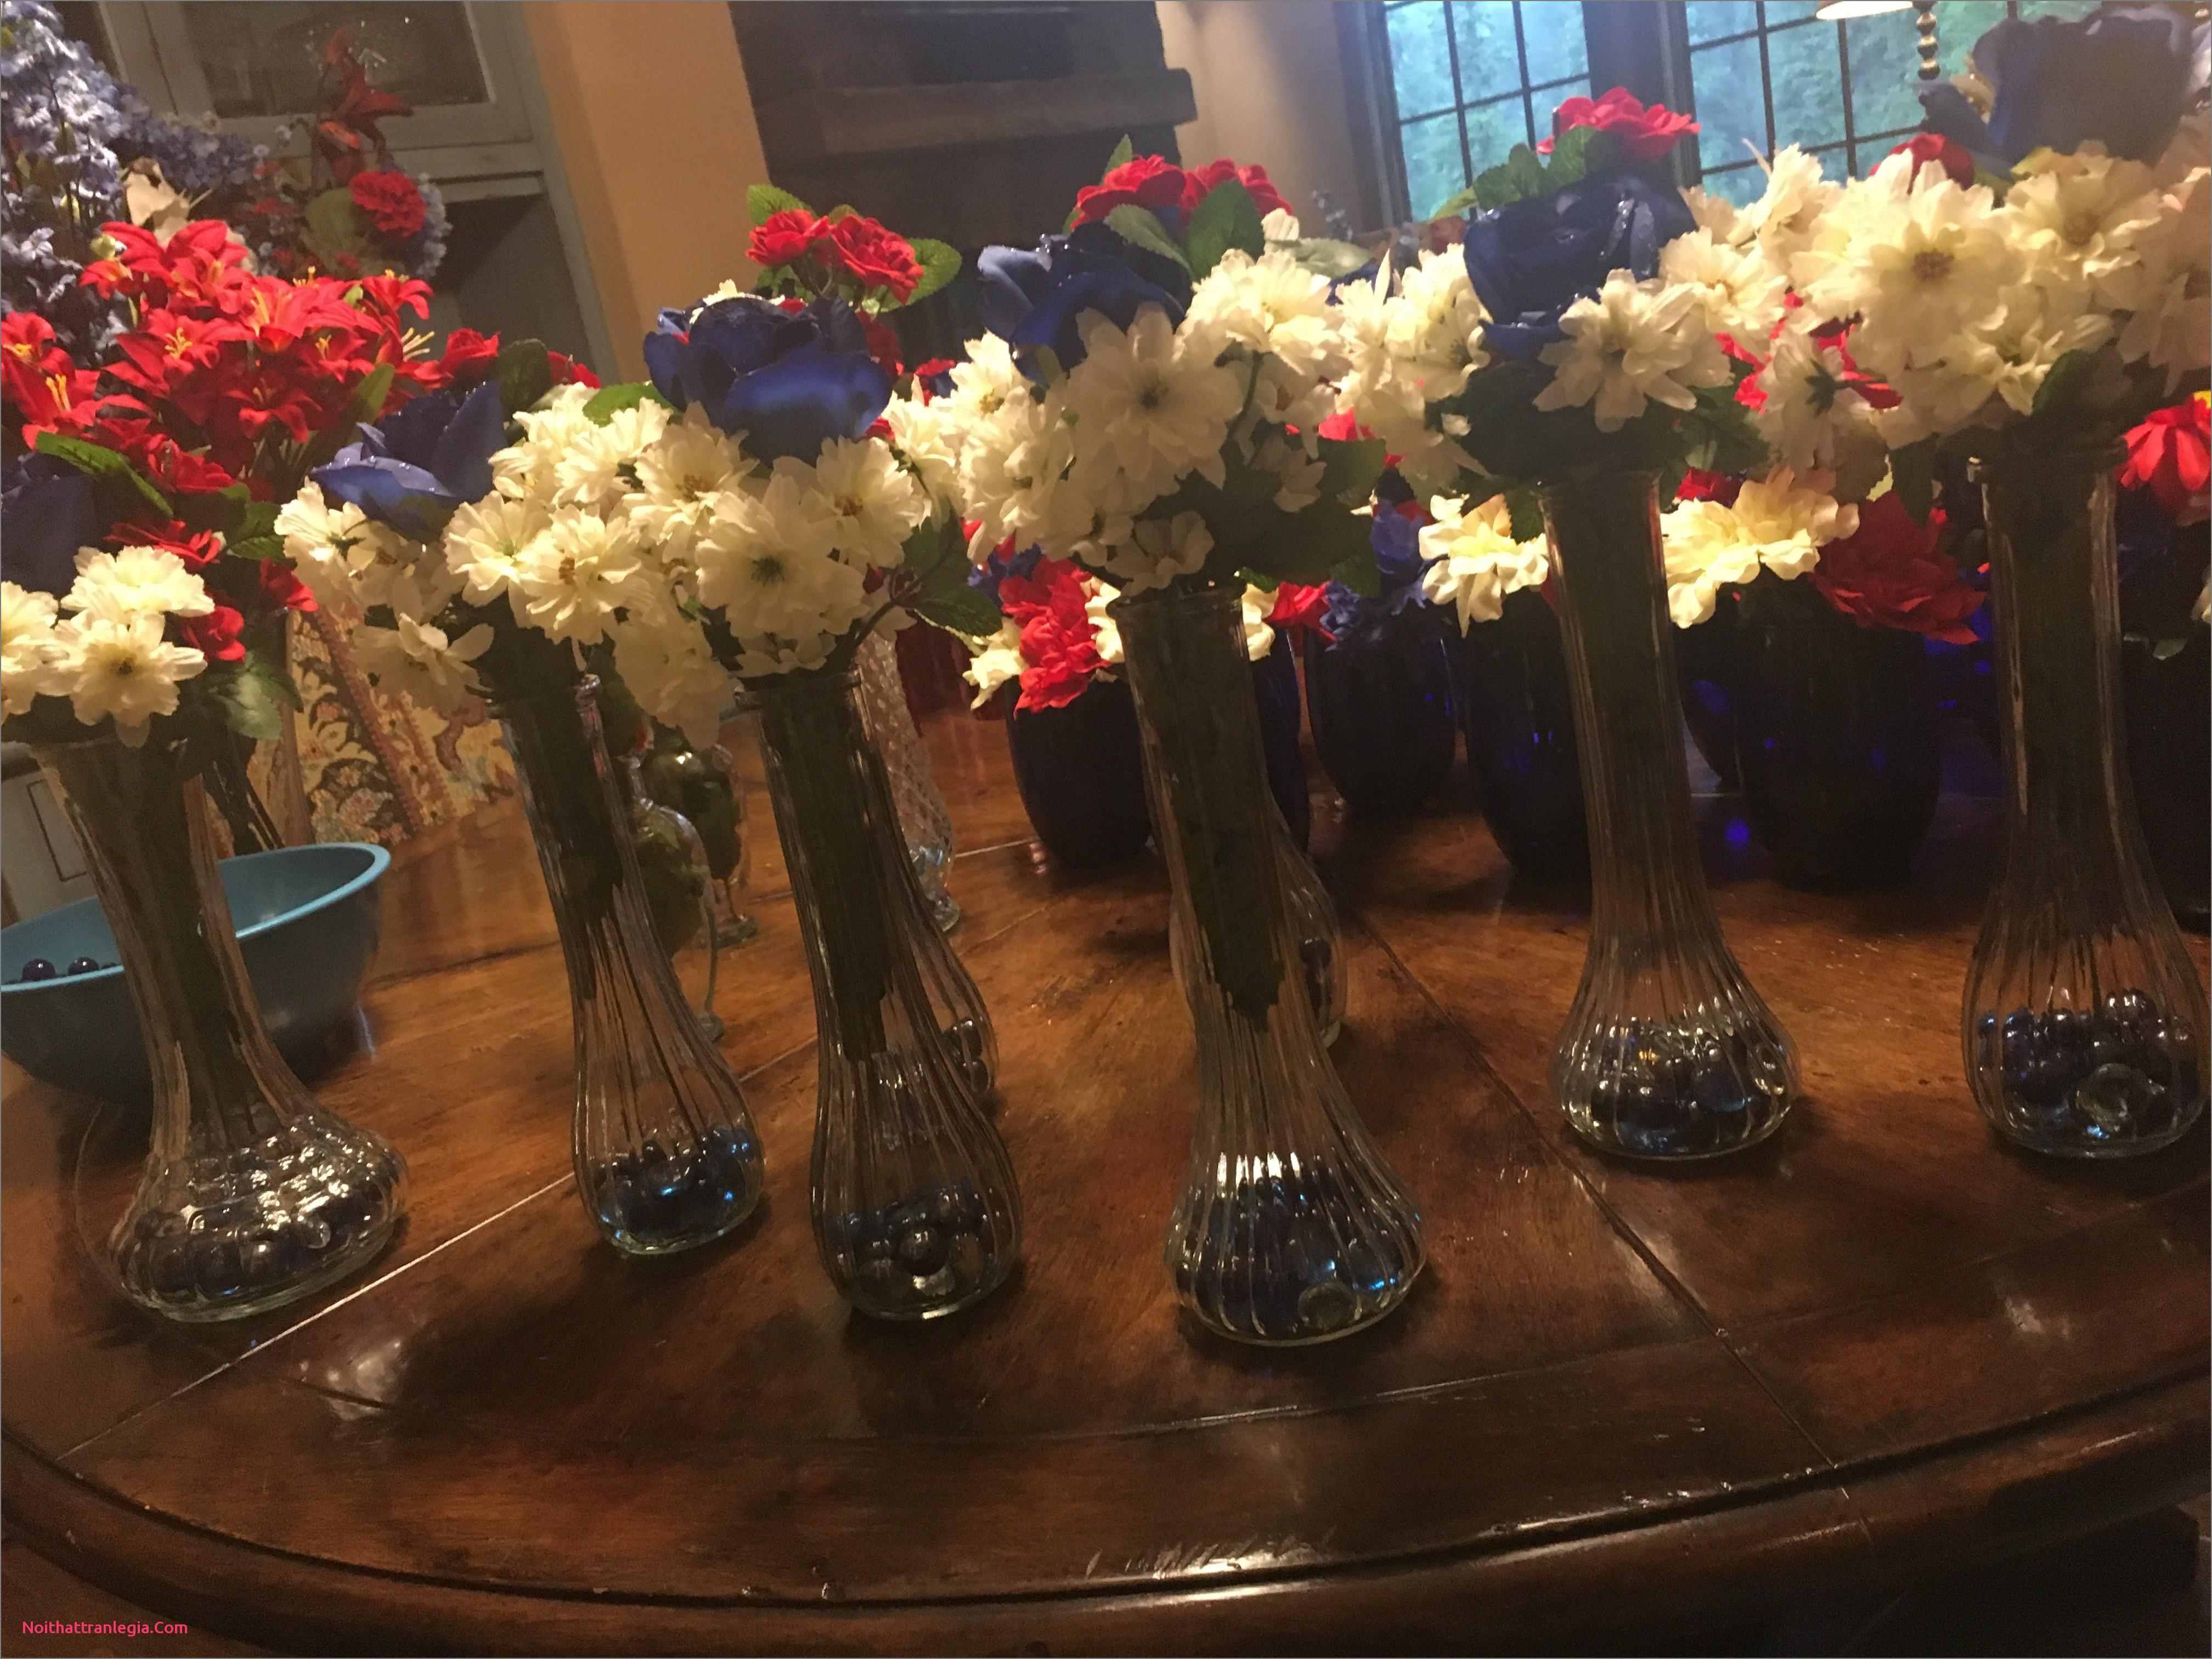 silver floral vase of 20 wedding vases noithattranlegia vases design with decoration line luxury dollar tree wedding decorations awesome h vases dollar vase i 0d